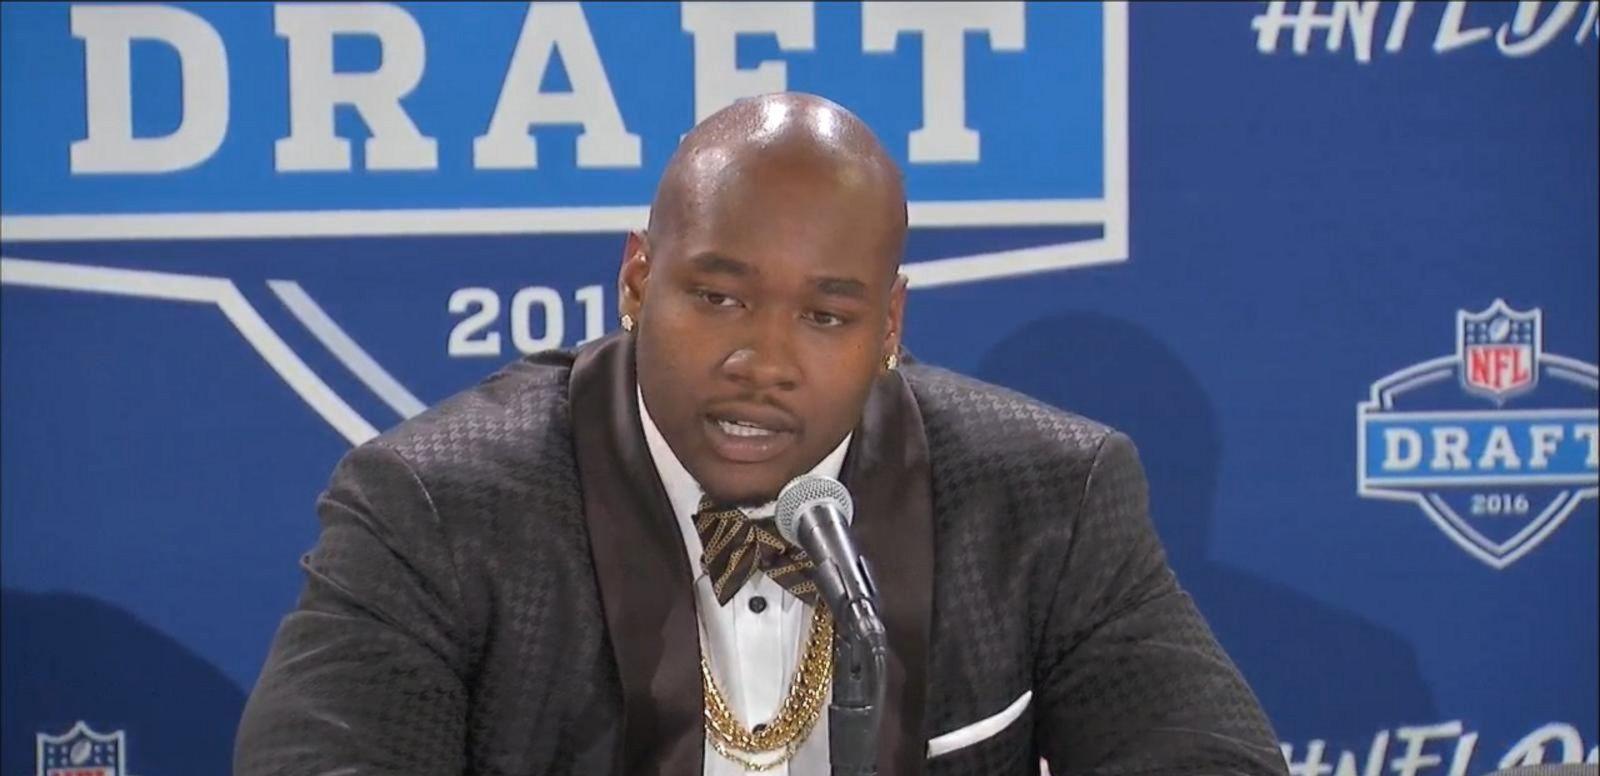 VIDEO: Football Star Drops in NFL Draft After Social Media Scandal